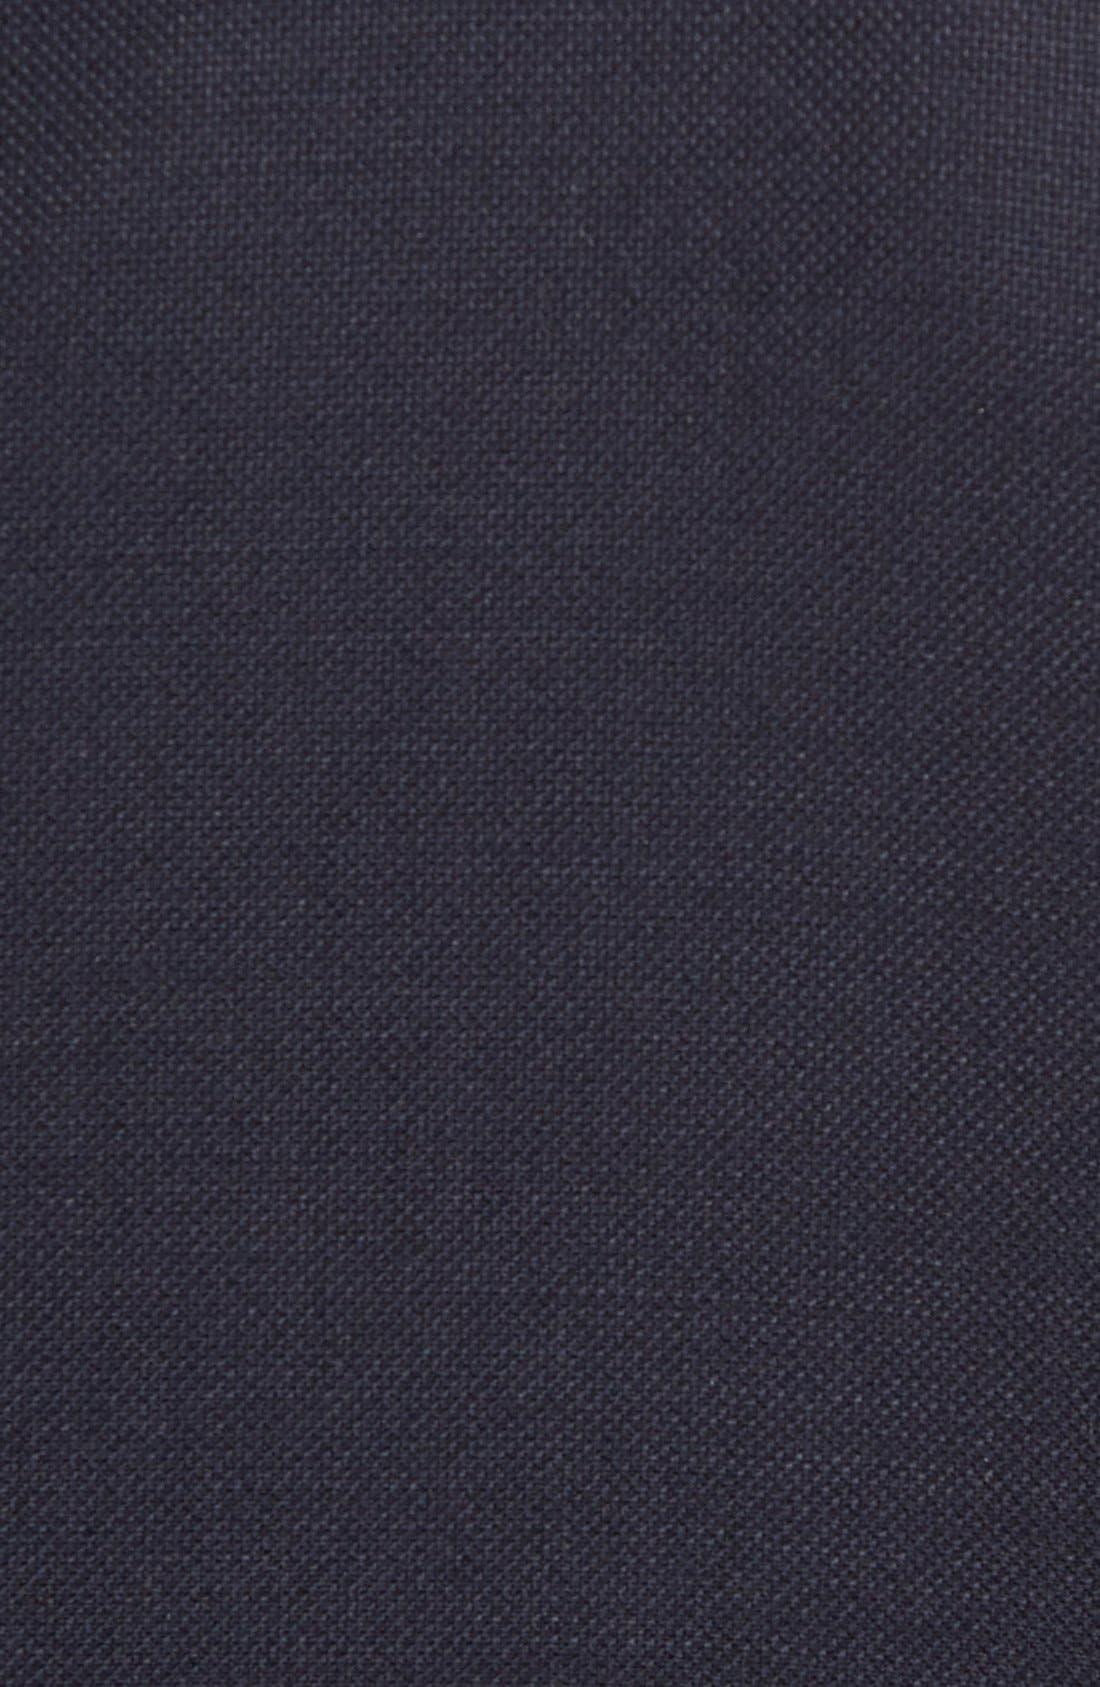 New York Classic Fit Wool Blend Blazer,                             Alternate thumbnail 7, color,                             NAVY